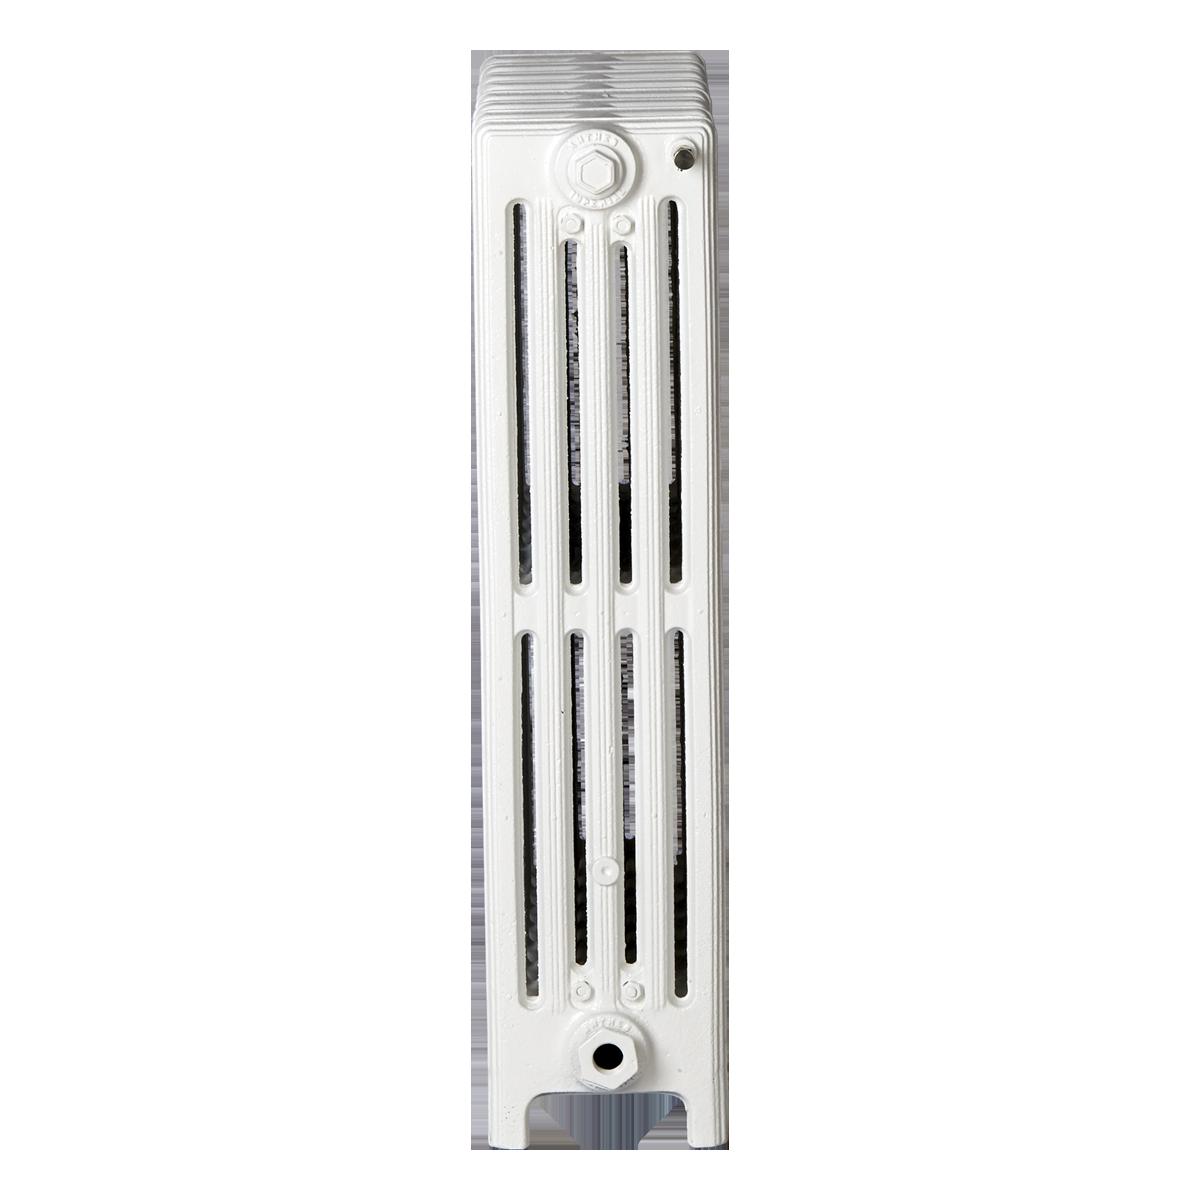 Ironworks Radiators Inc. classic slender column, square top radiator